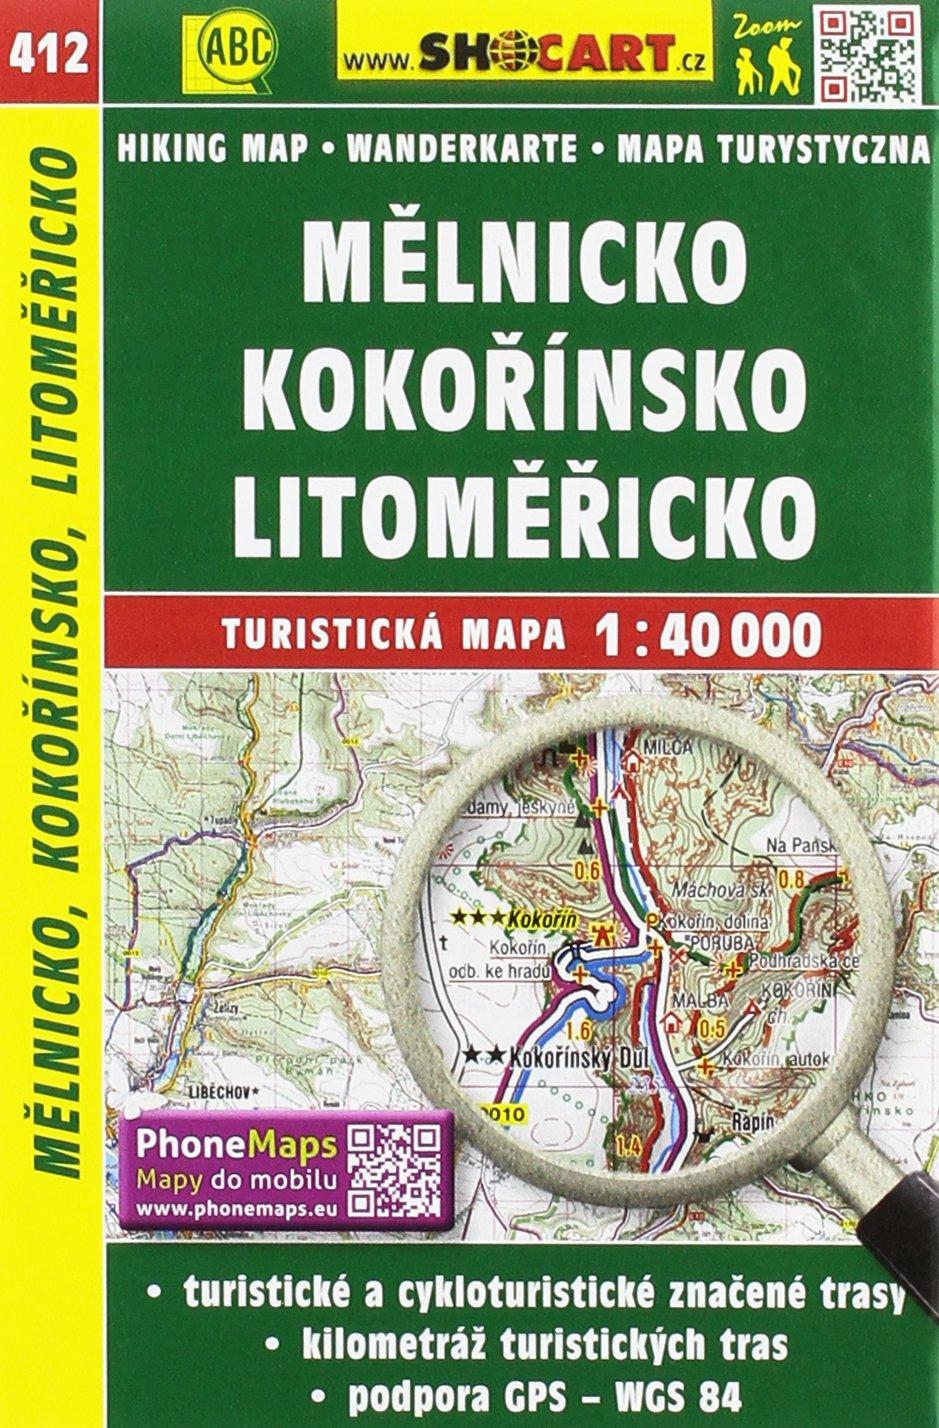 Wanderkarte Tschechien Melnicko, Kokorinsko, Litomericko 1 : 40 000: Turisticke Mapy Cesko